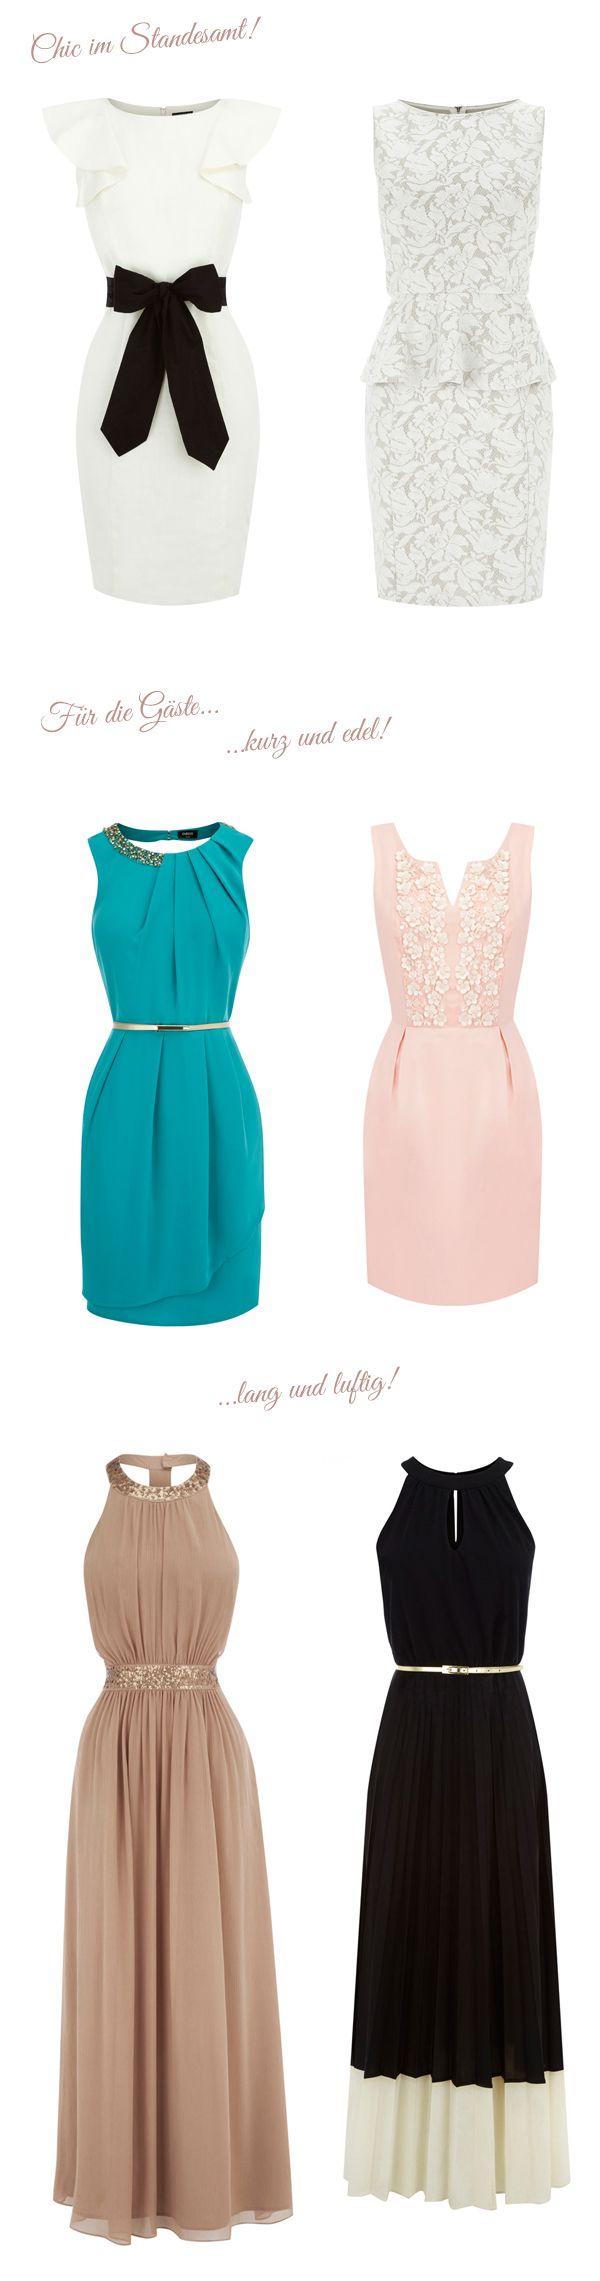 102 best Kleider images on Pinterest | Nice dresses, Prom dresses ...